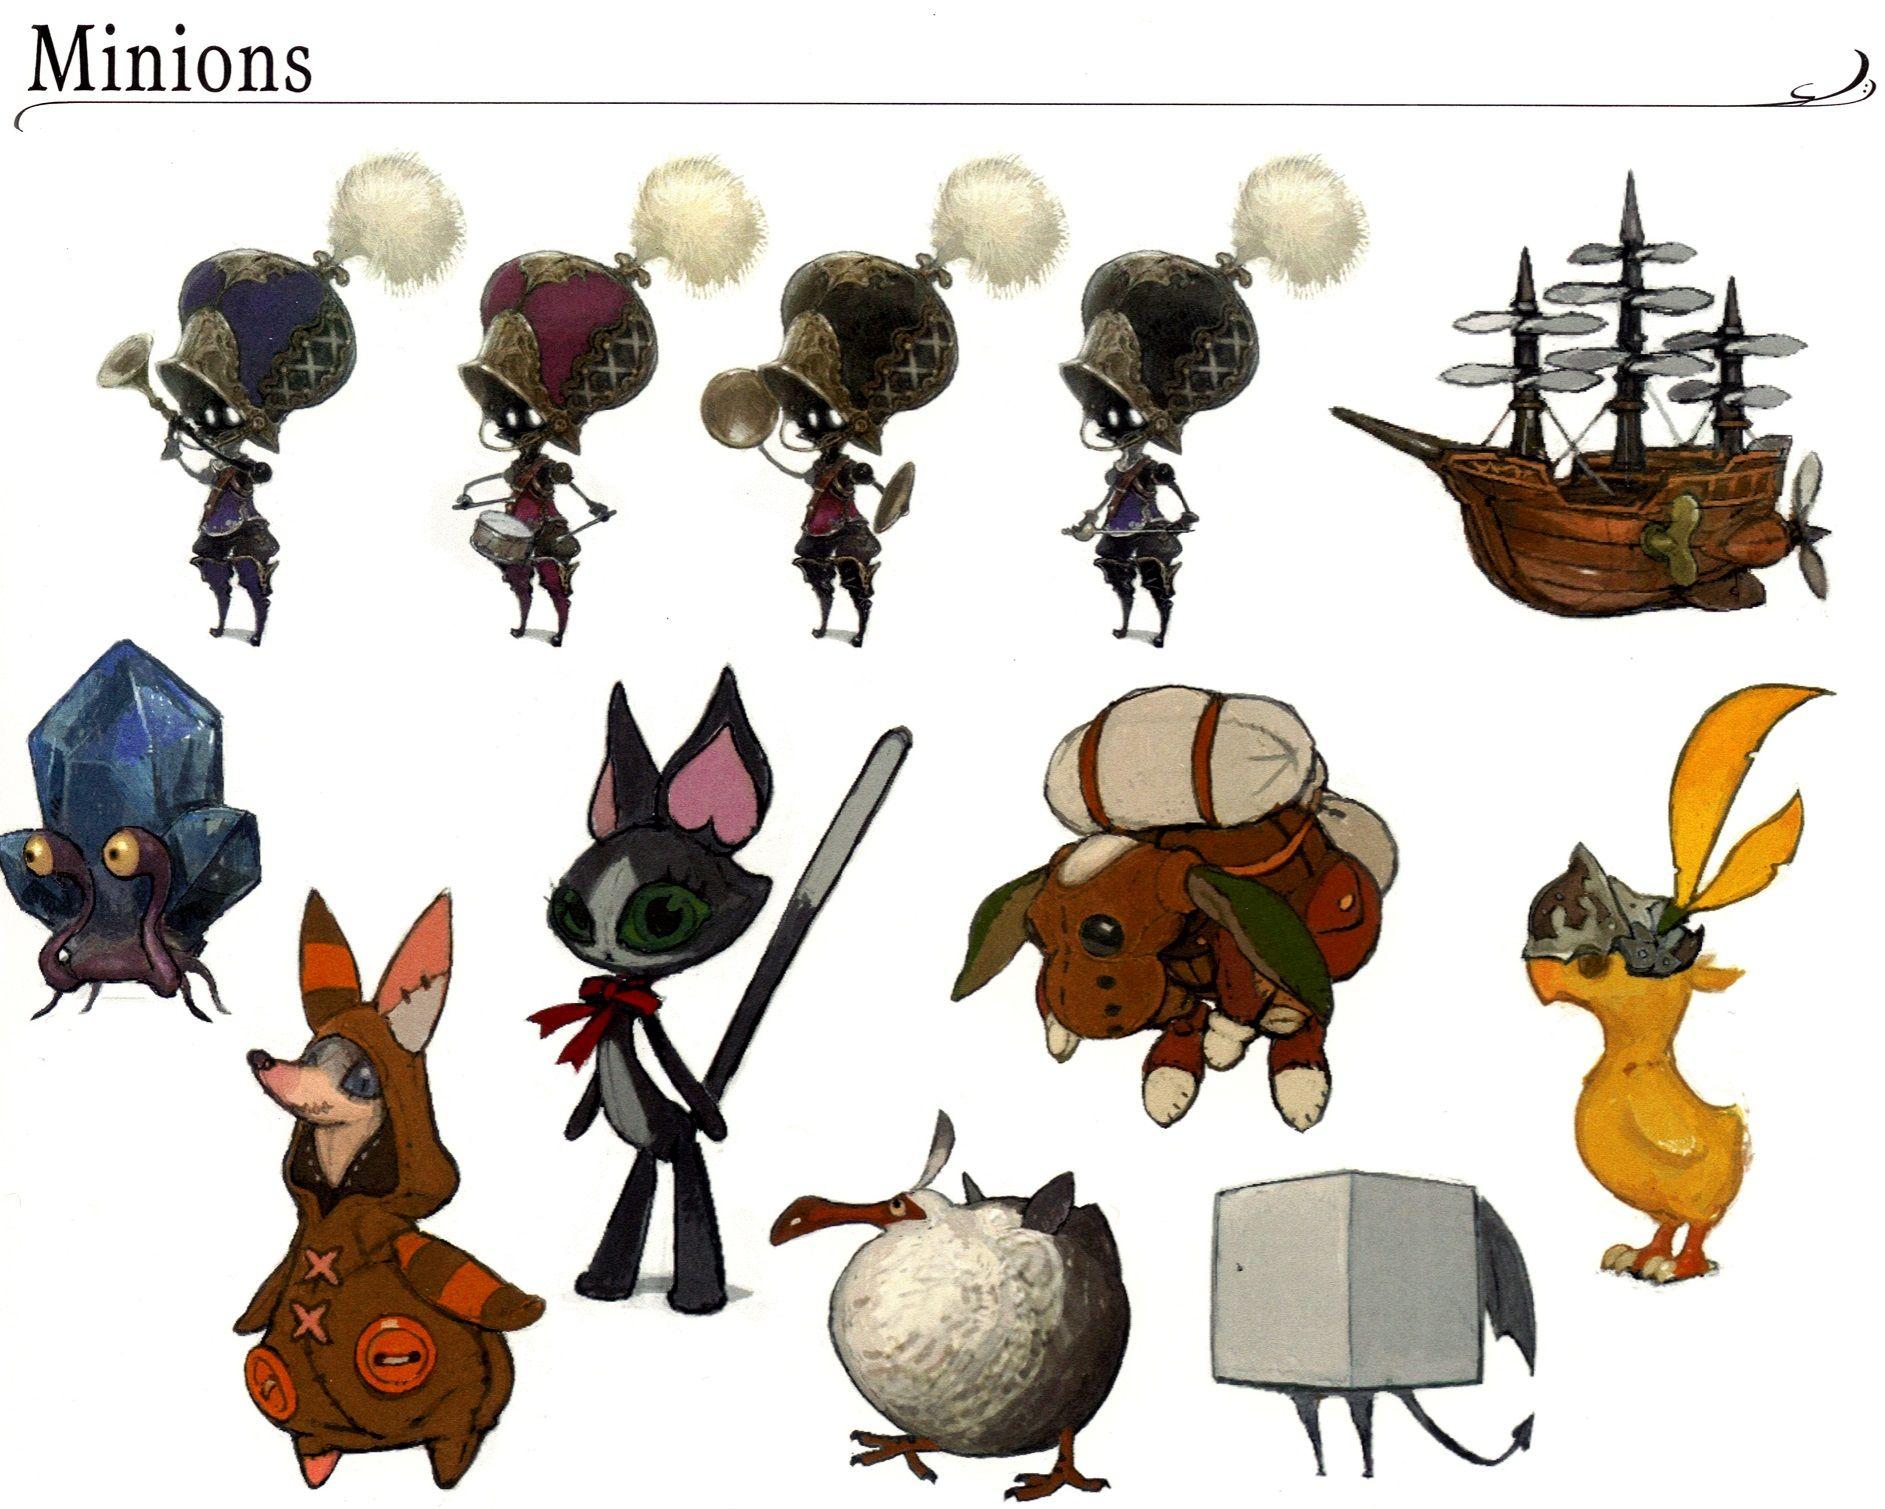 FFXIV Minions | concept art | Final fantasy, Final fantasy